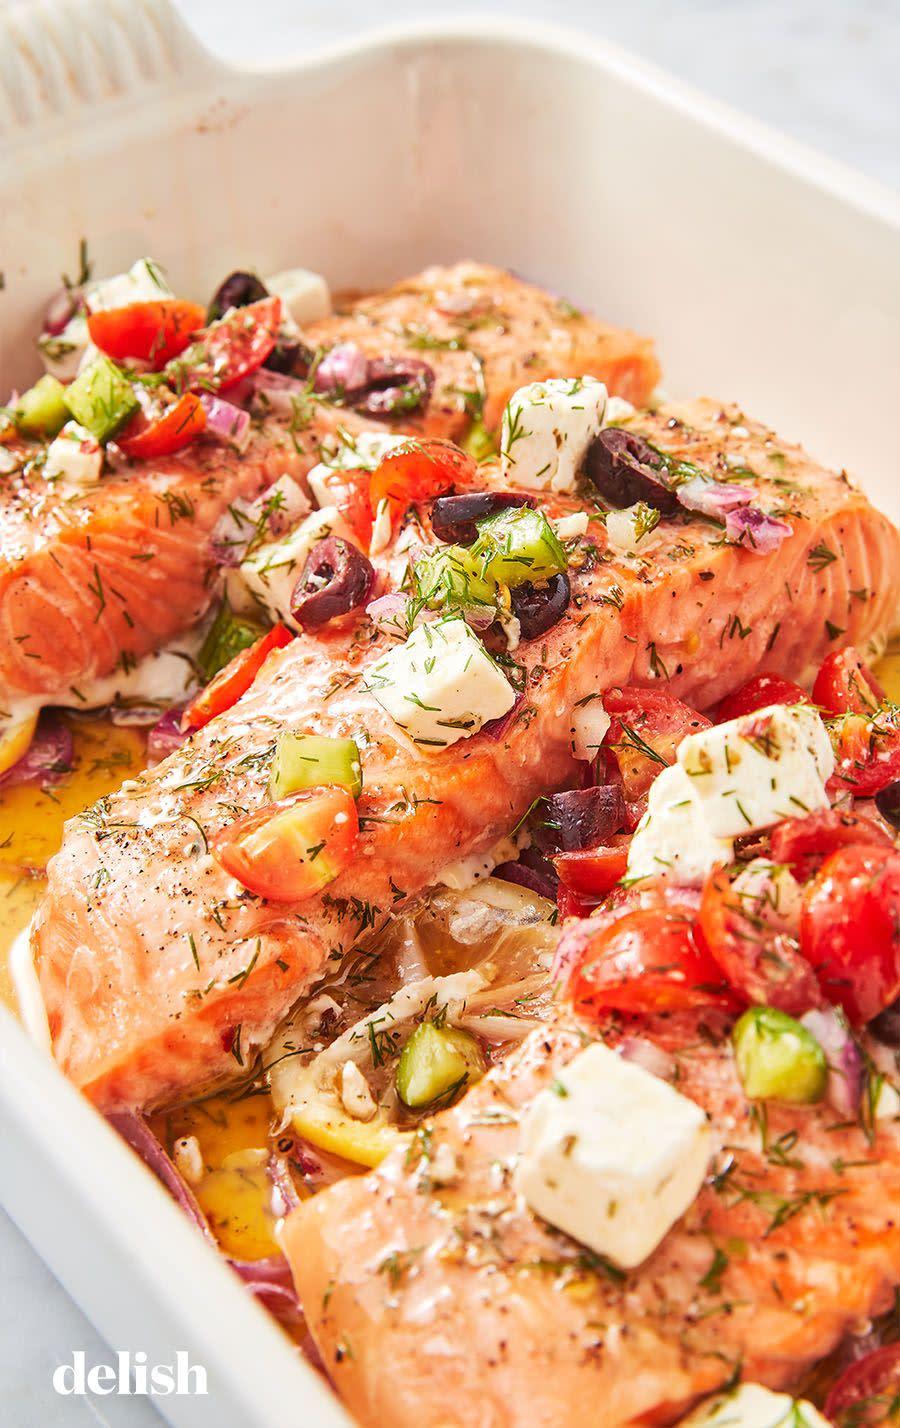 "<p>Extra veggies and feta, please!</p><p>Get the recipe from <a href=""https://www.delish.com/cooking/recipe-ideas/a26103199/greek-salmon-recipe/"" rel=""nofollow noopener"" target=""_blank"" data-ylk=""slk:Delish"" class=""link rapid-noclick-resp"">Delish</a>.</p>"